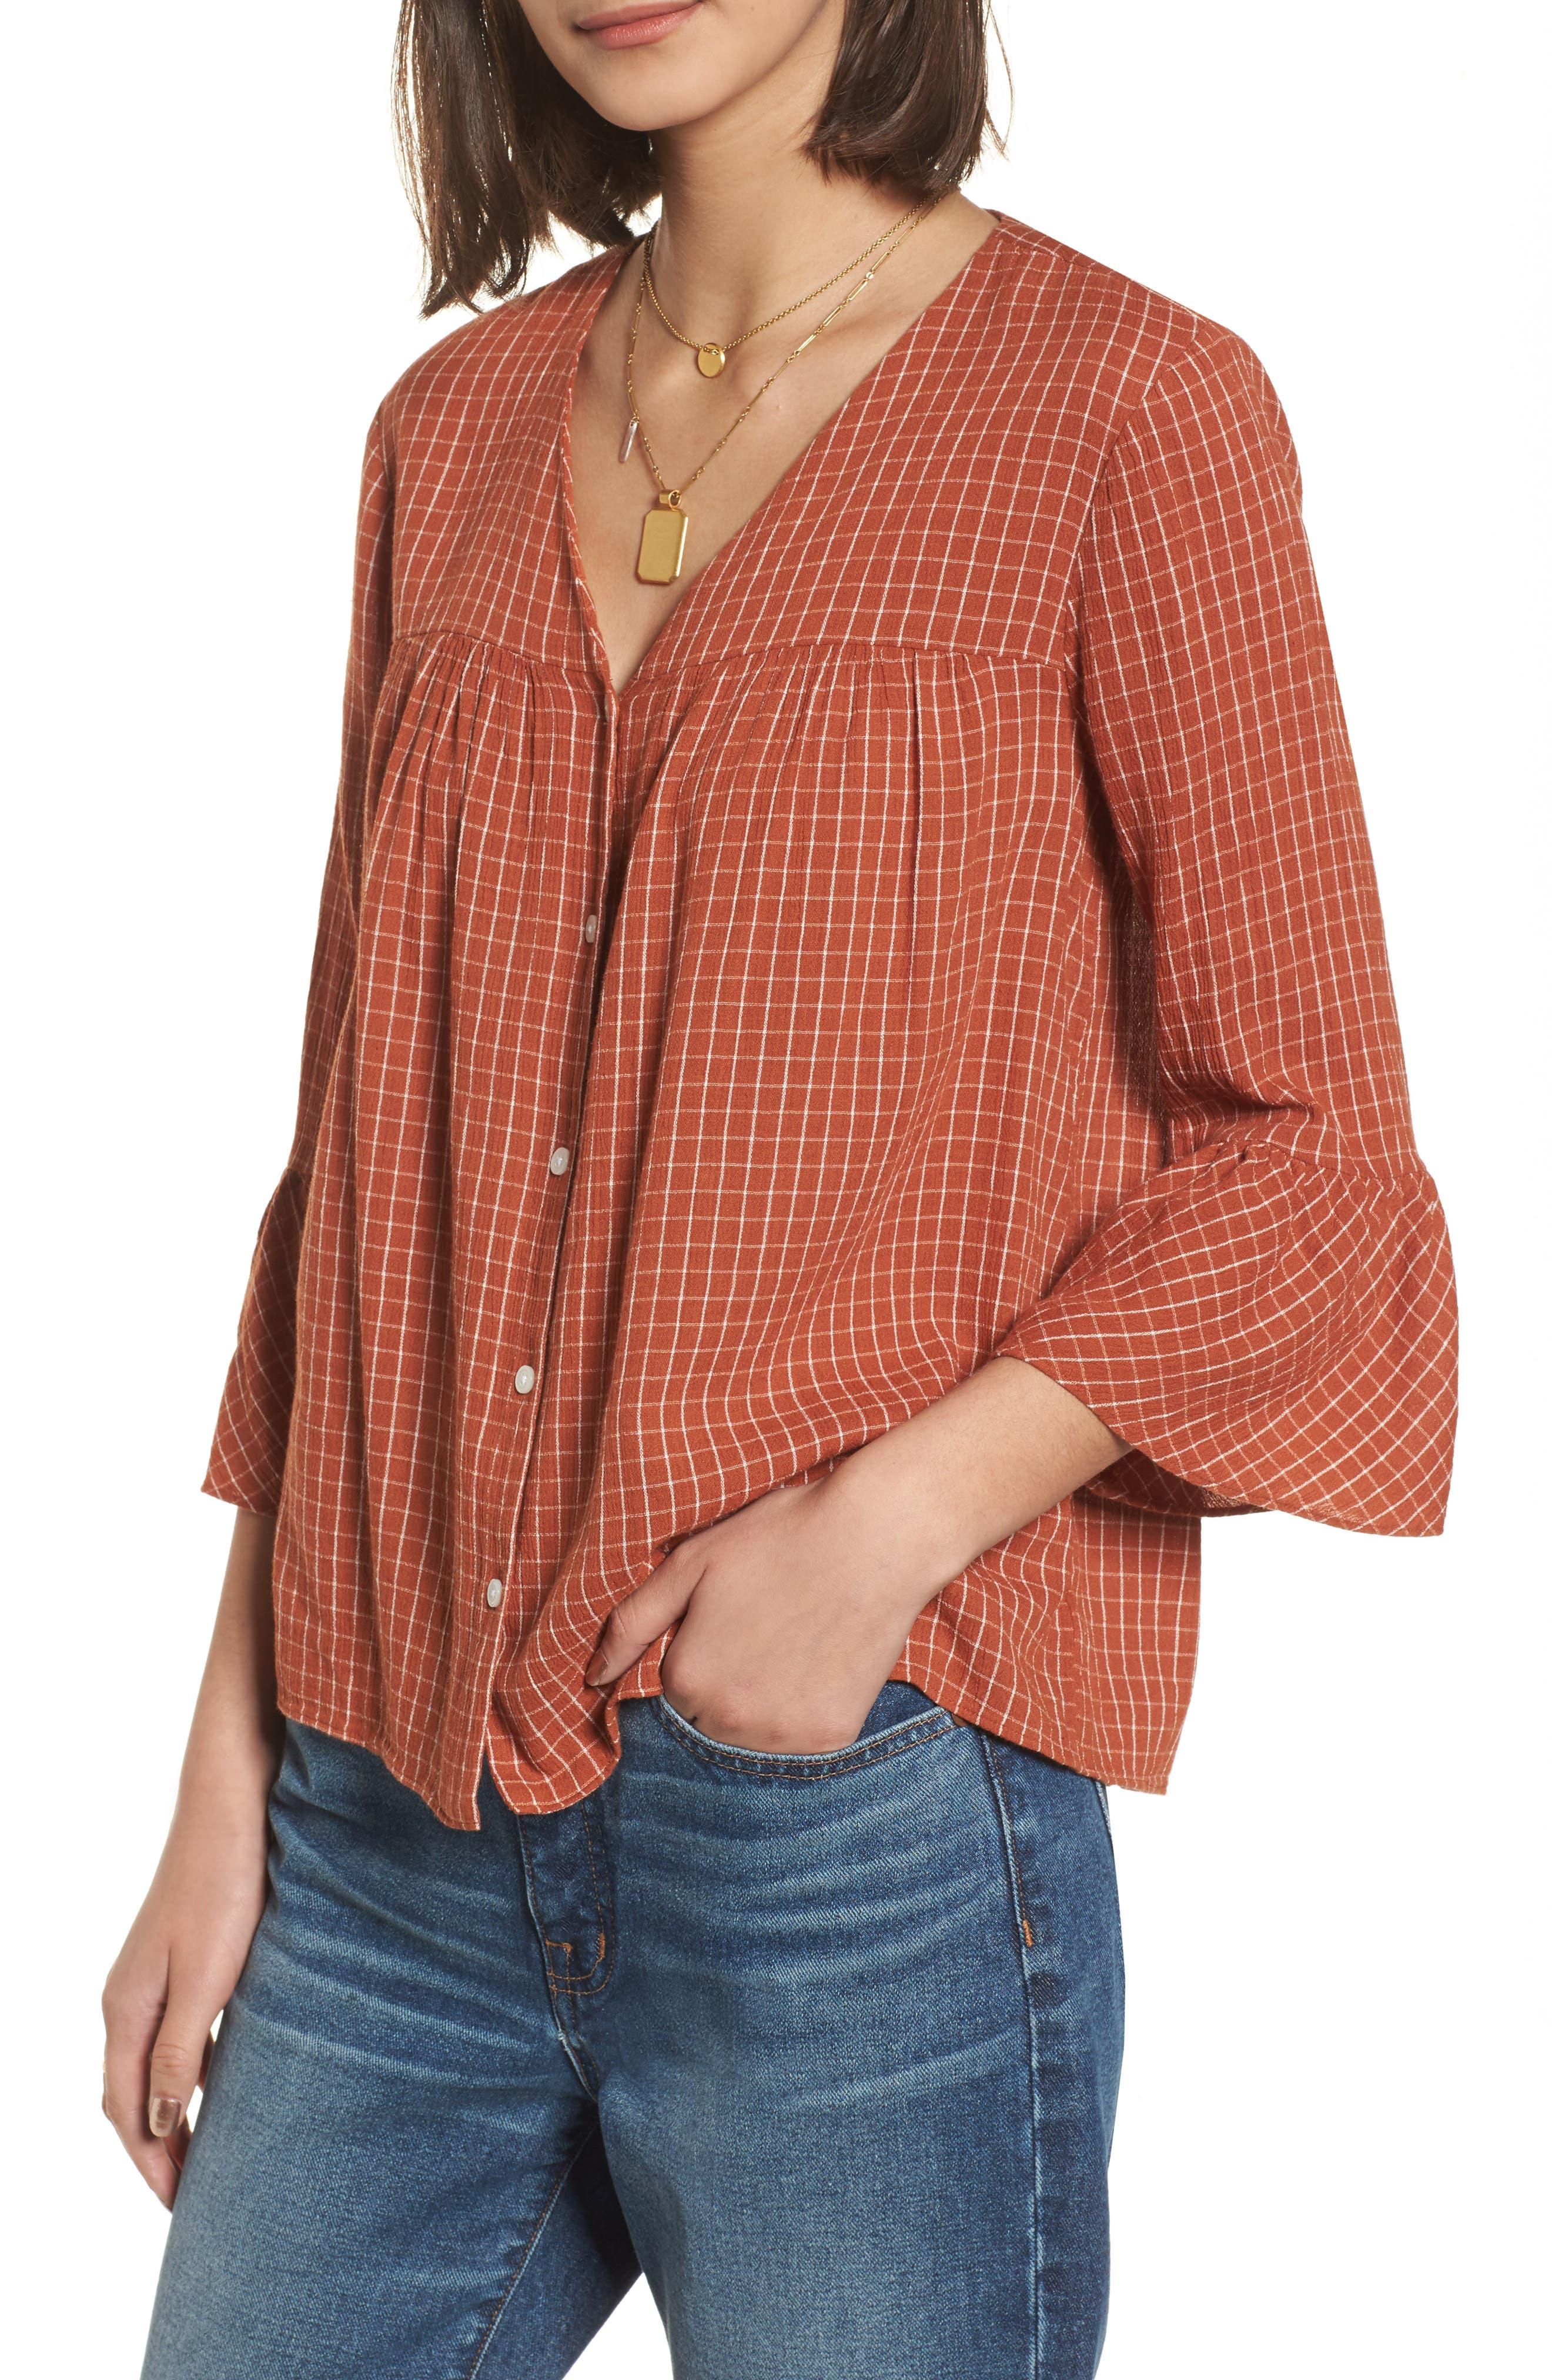 Veranda Bell Sleeve Shirt,                             Main thumbnail 1, color,